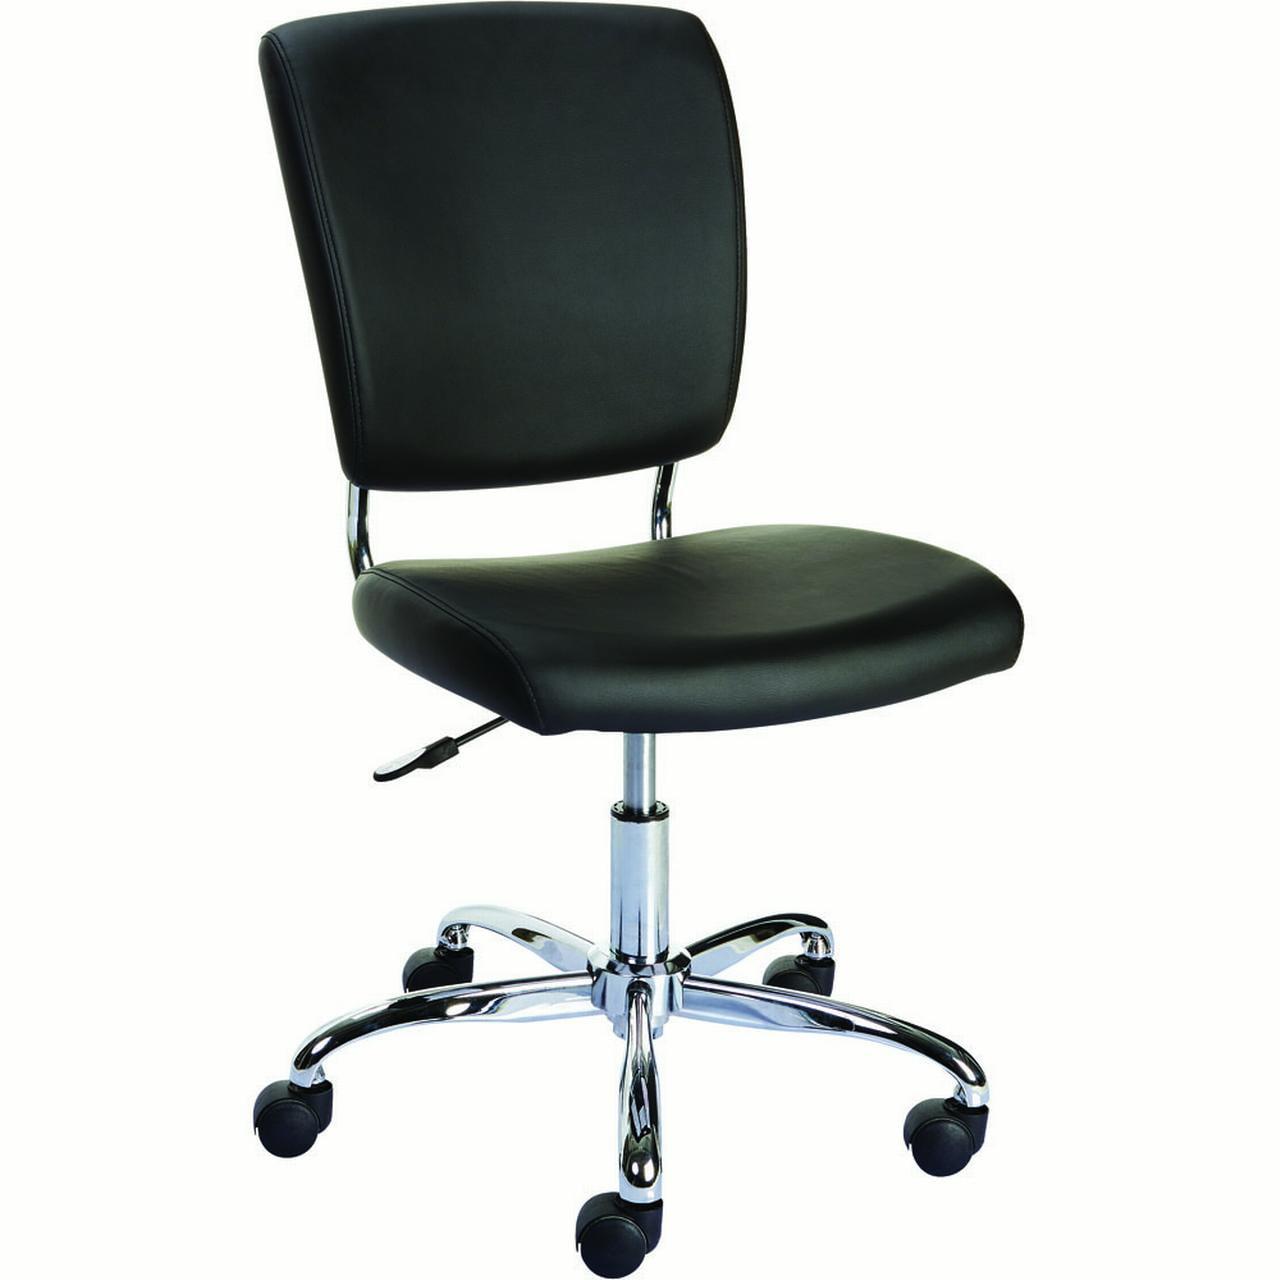 Staples 27373 Nadler Luxura Office Chair Armless Black Walmartcom